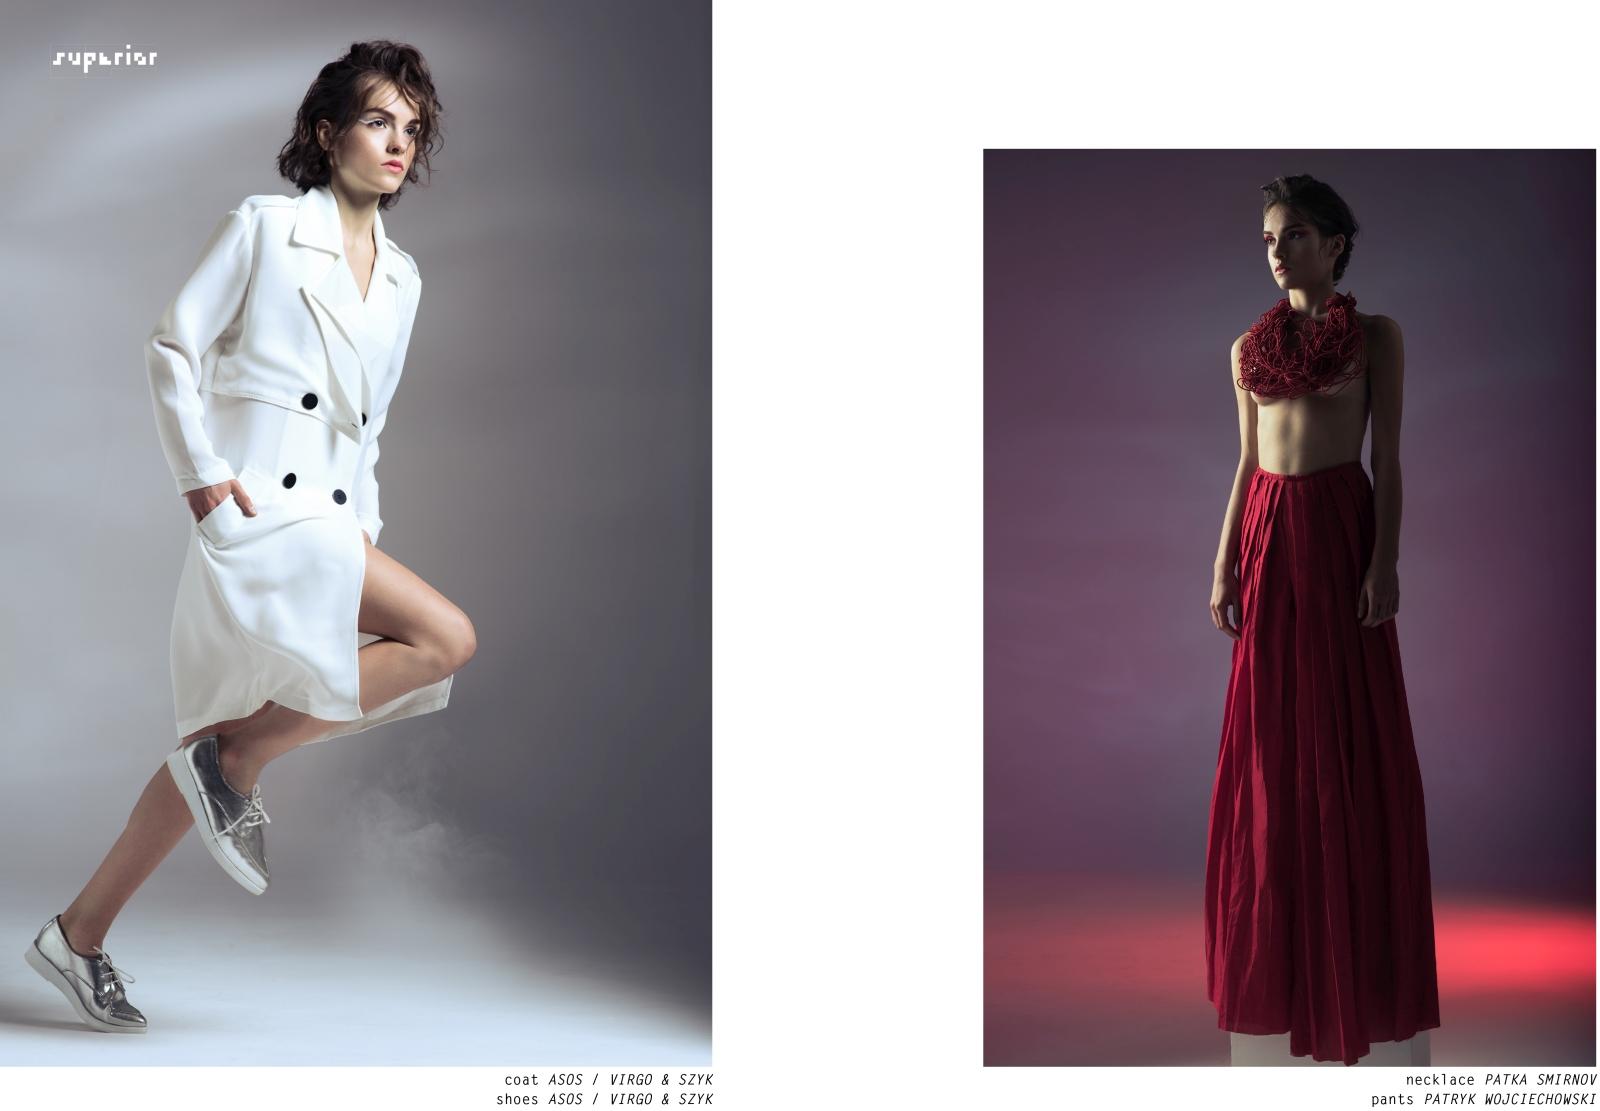 I-AM-THE-REBEL-Fashion-Editorial-by-ARTUR-MADEJ-4